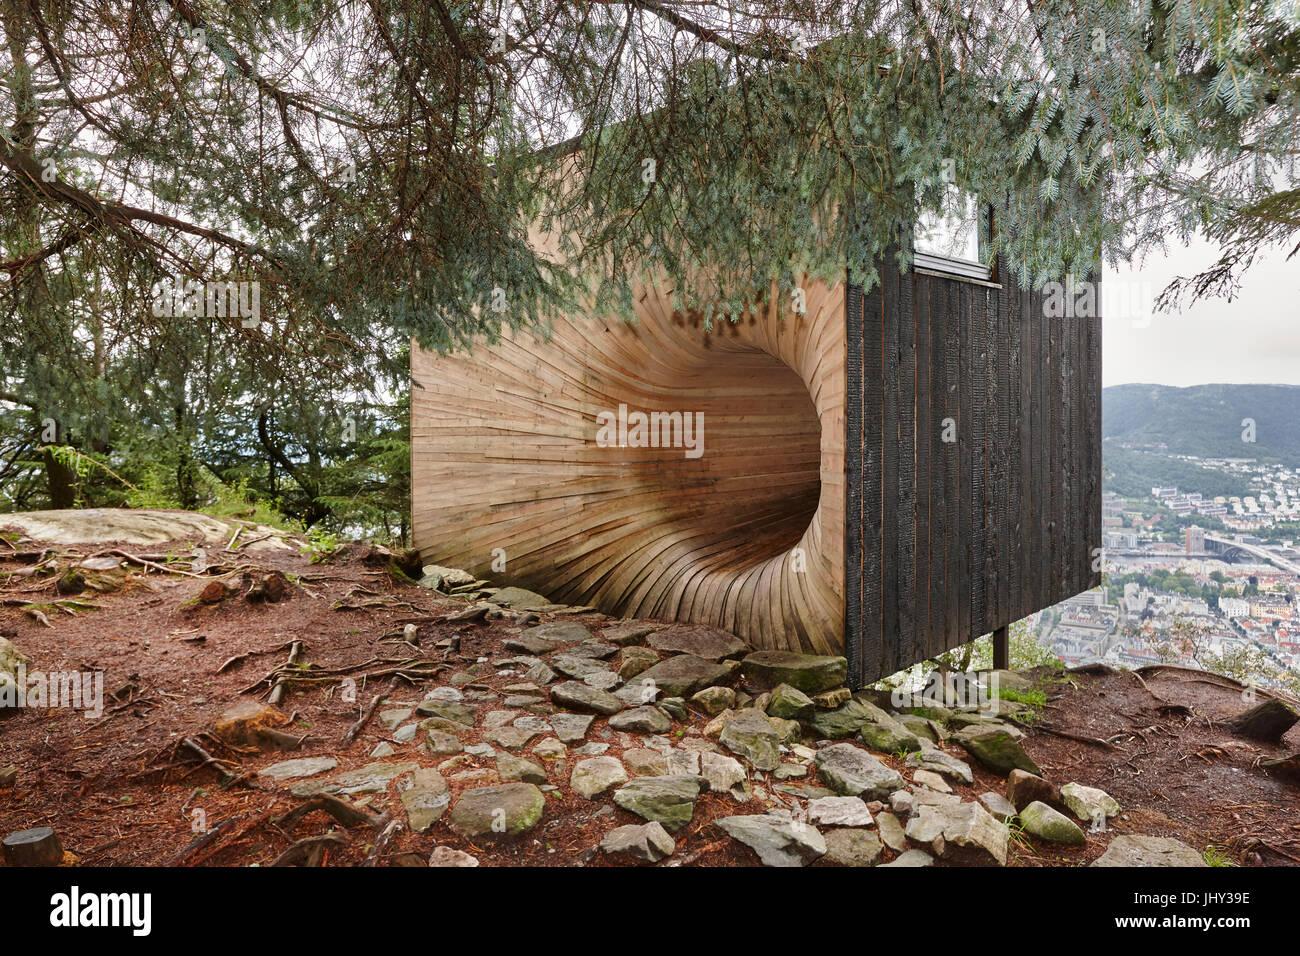 Norwegian wooden modern cabin in the forest tubakuba bergen area stock photo royalty free - Norwegian wood houses ...